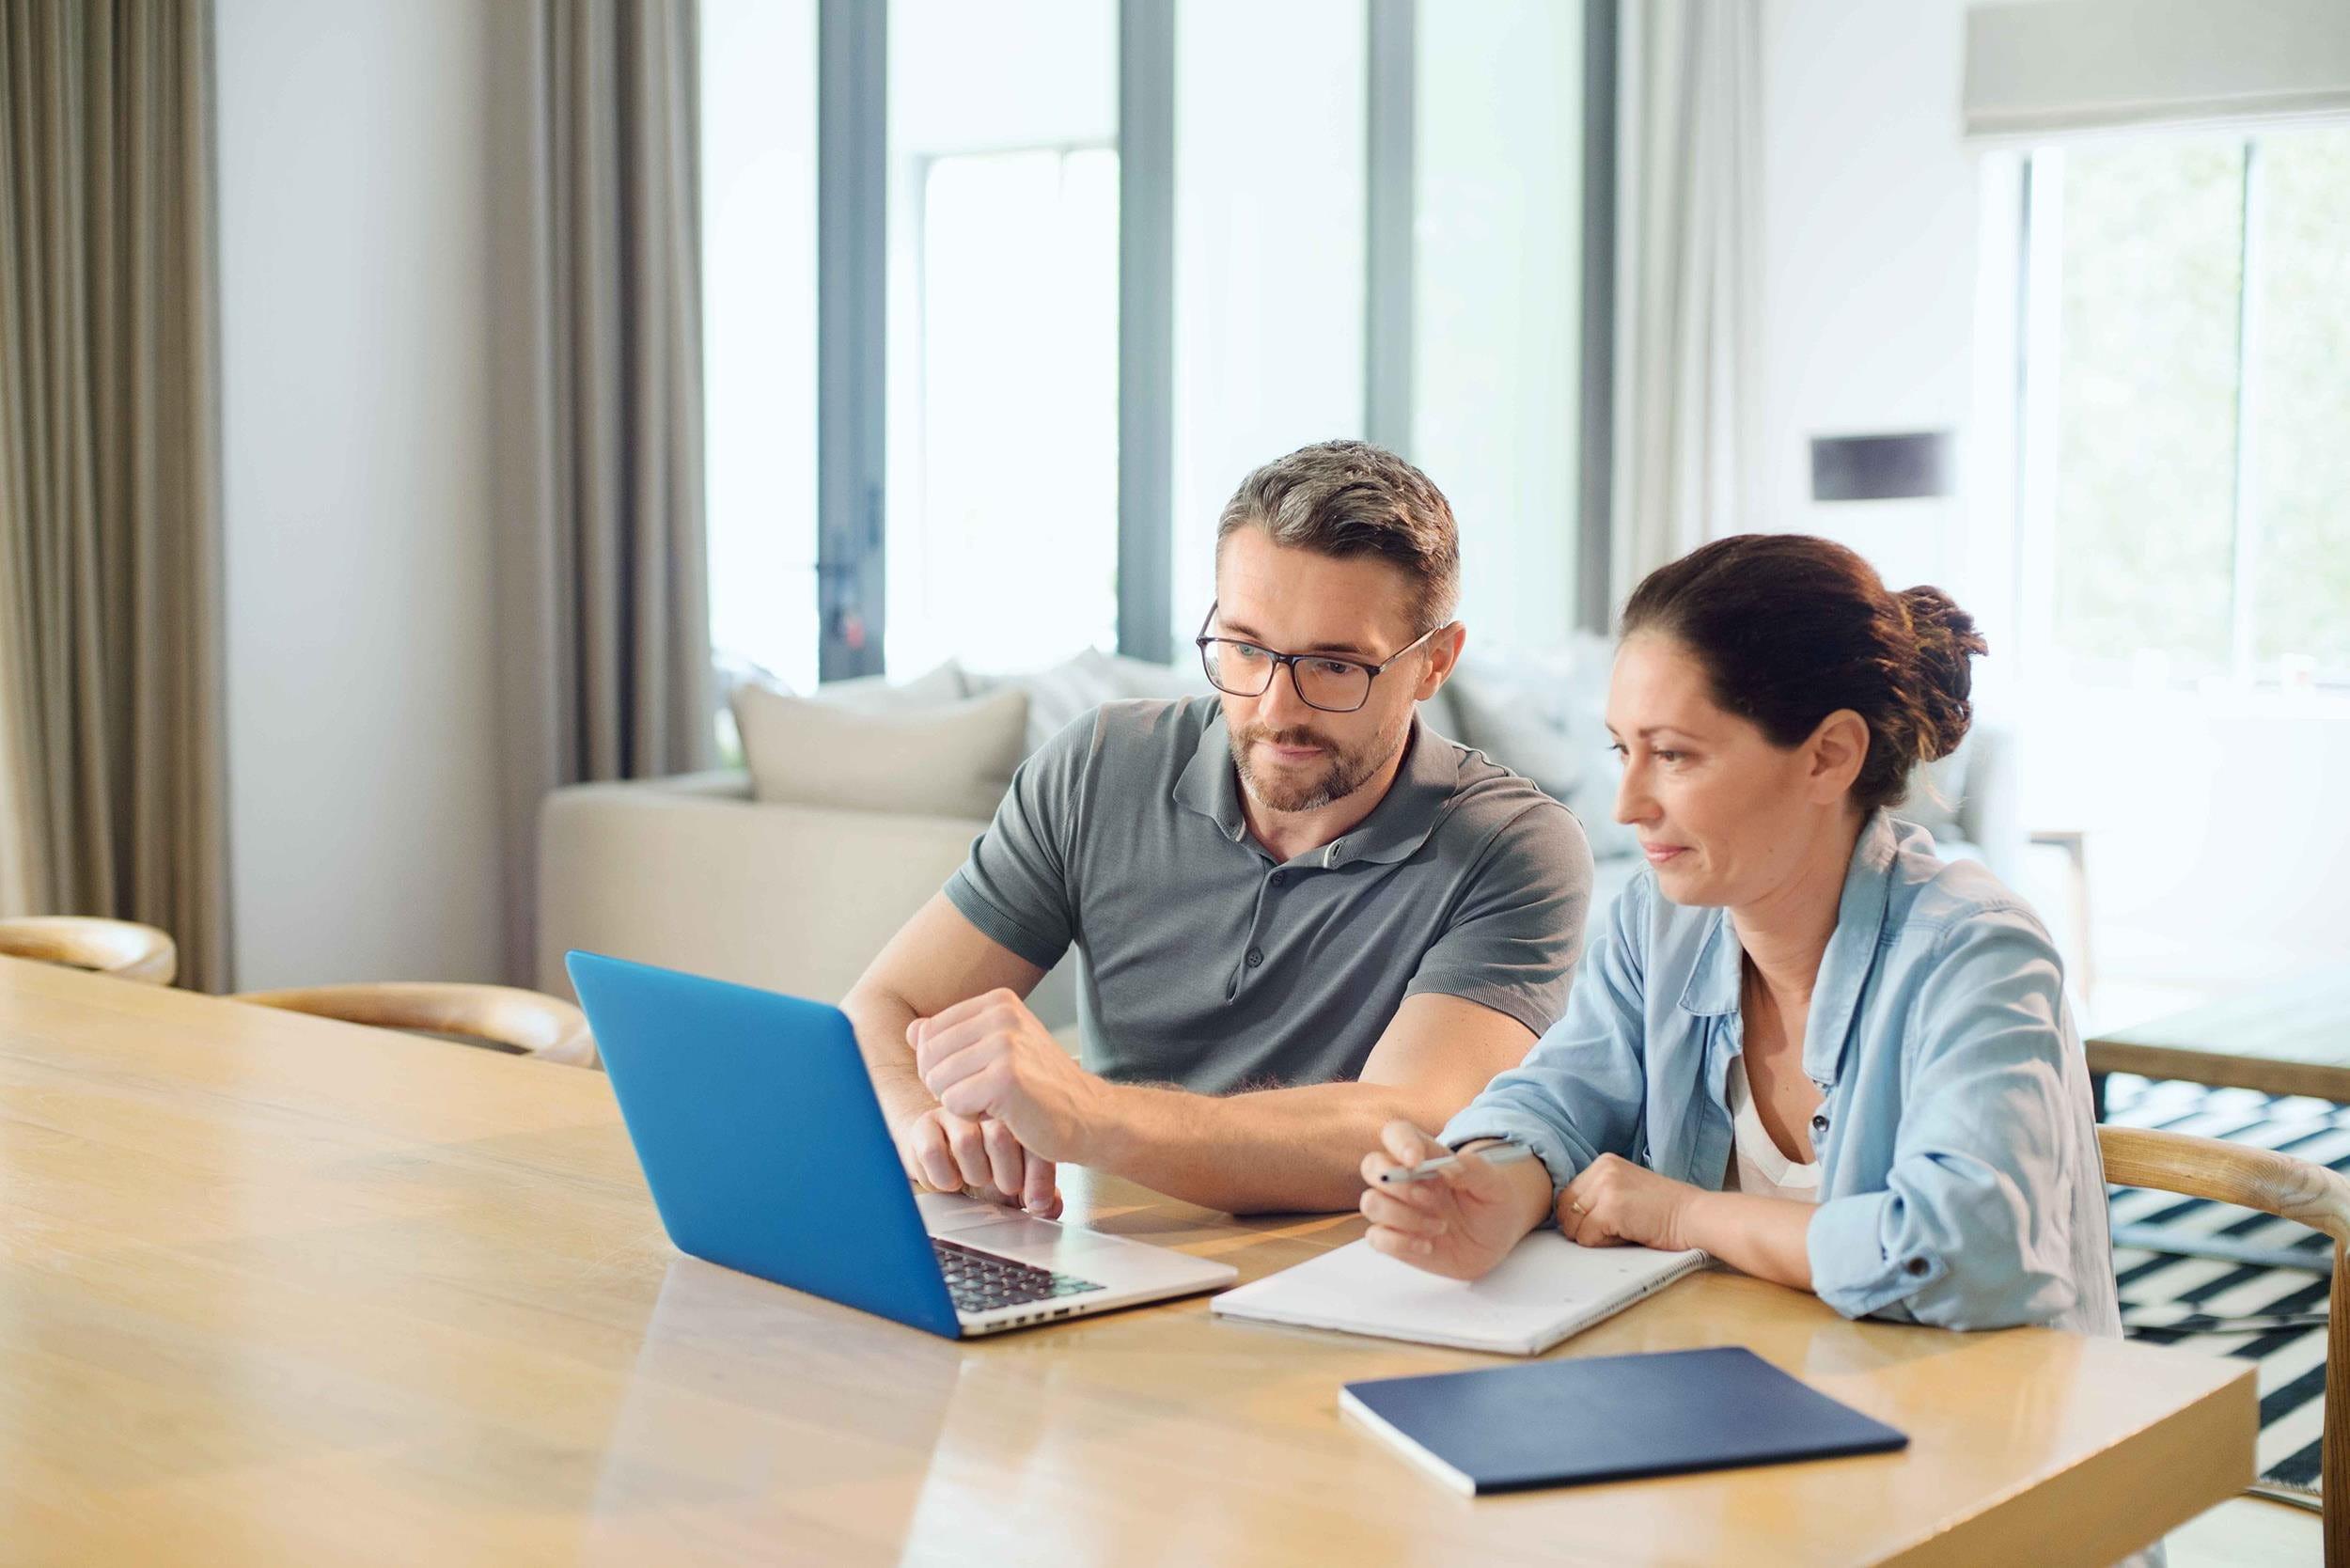 Uomo e donna con computer portatile